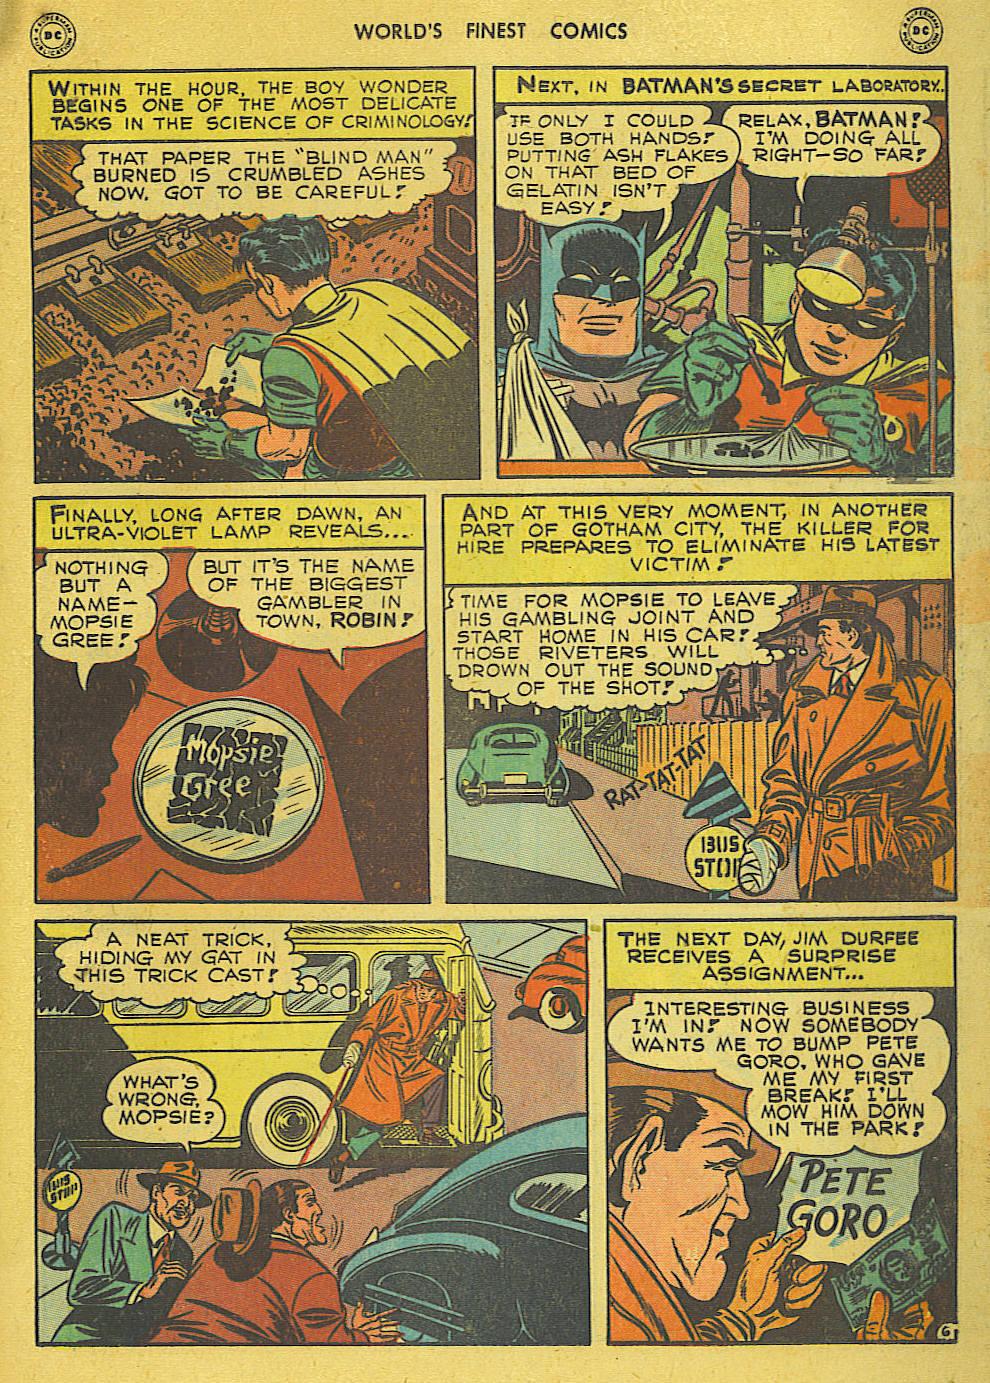 Read online World's Finest Comics comic -  Issue #34 - 67